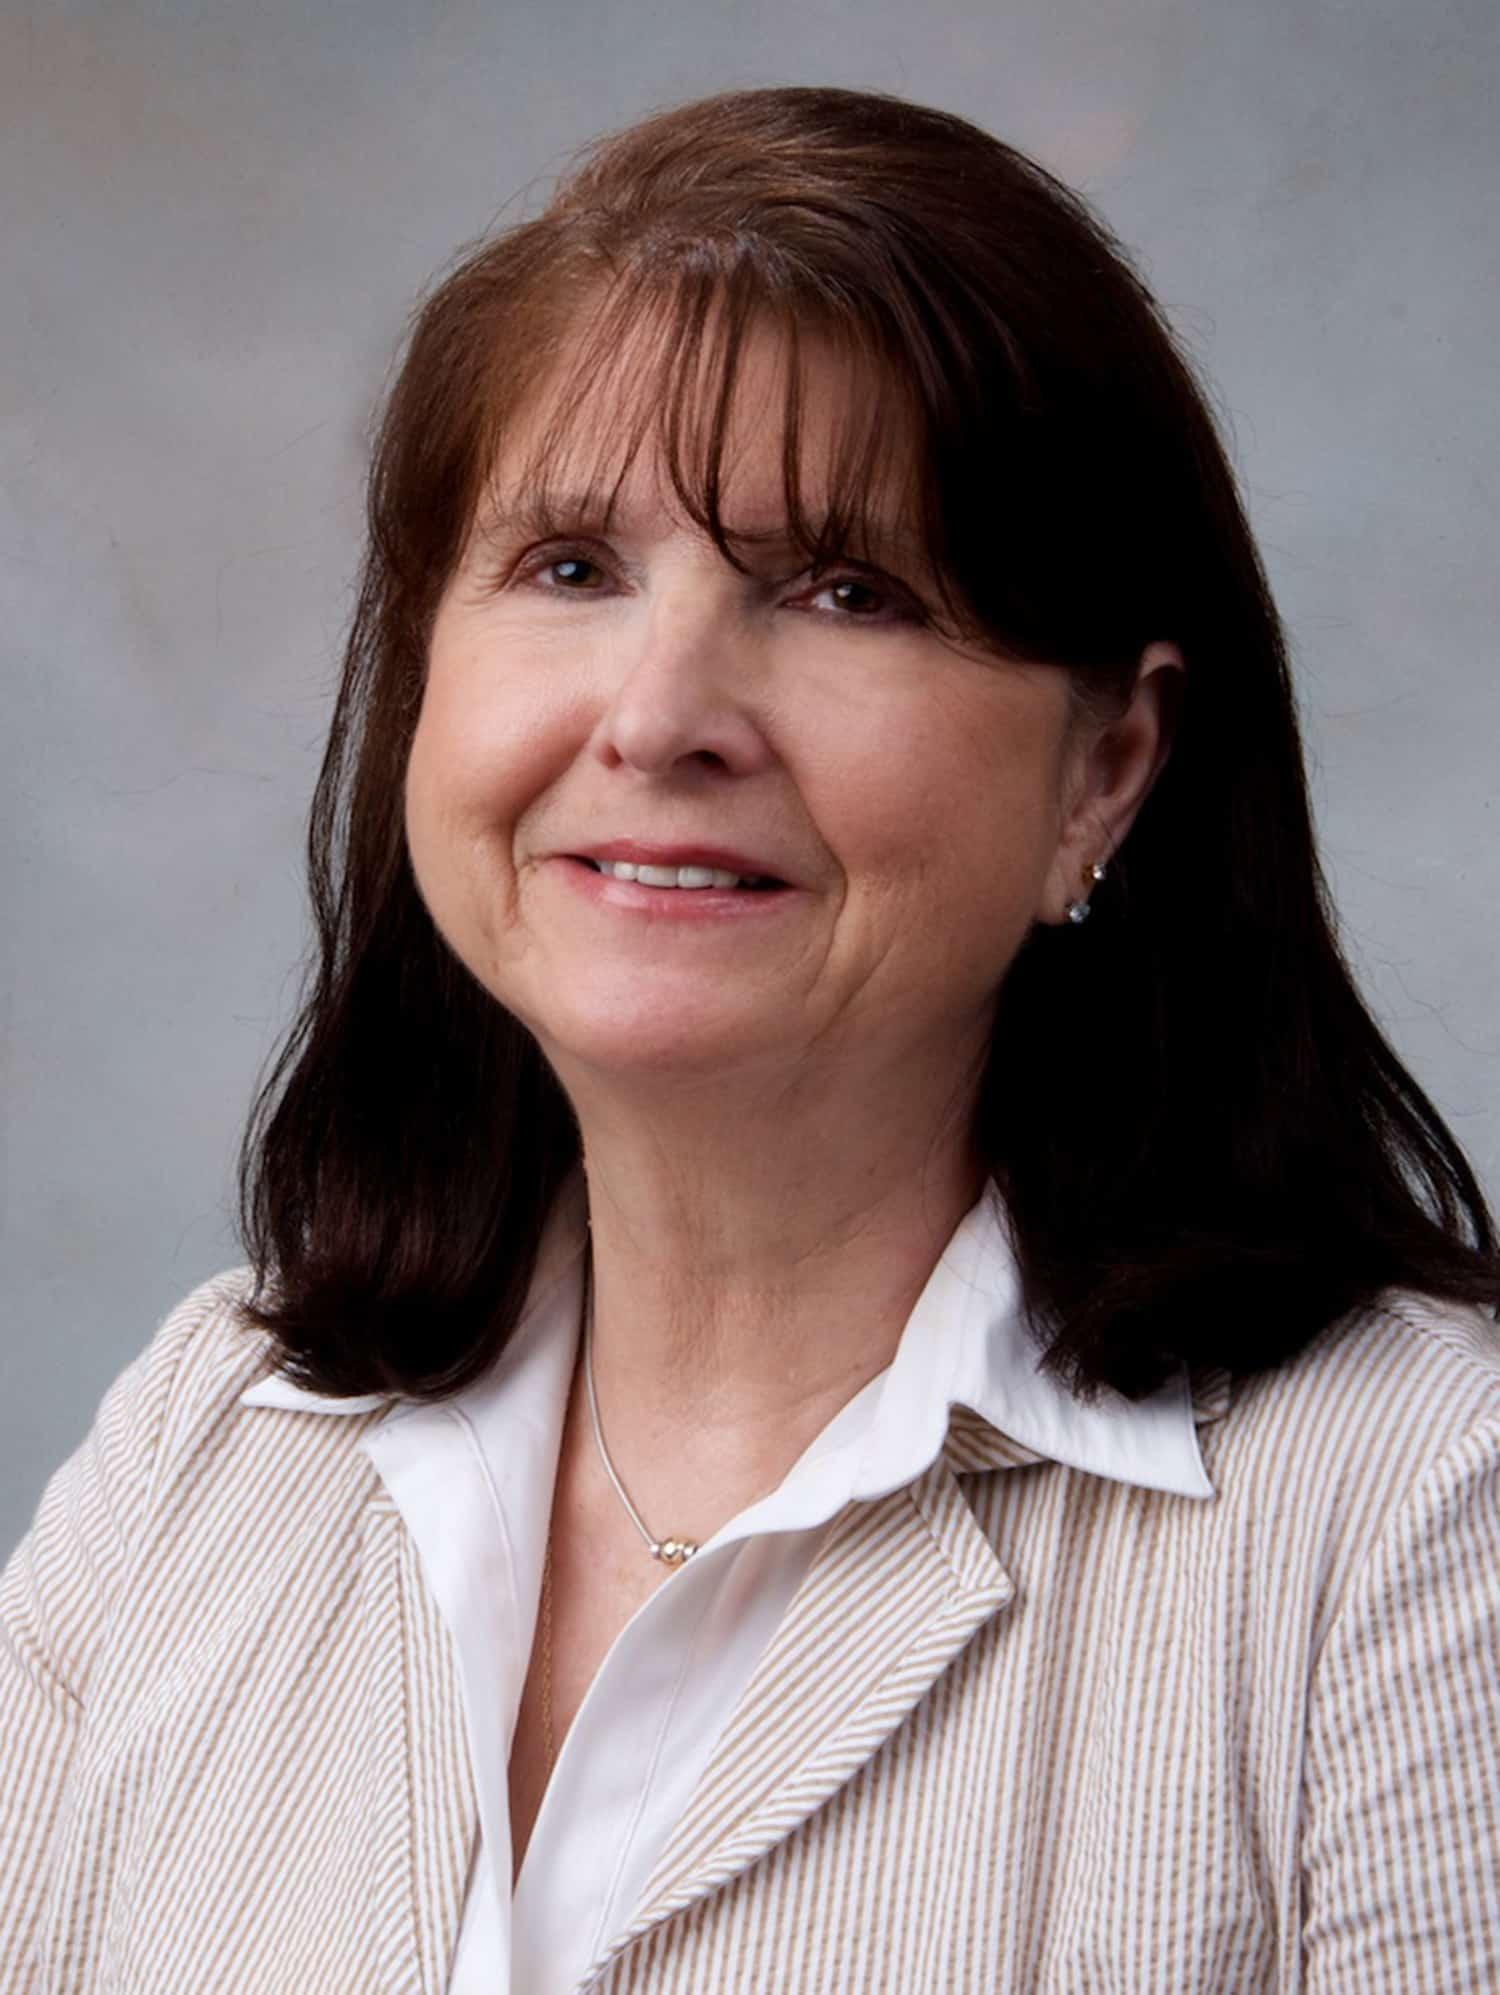 Carole Phelps